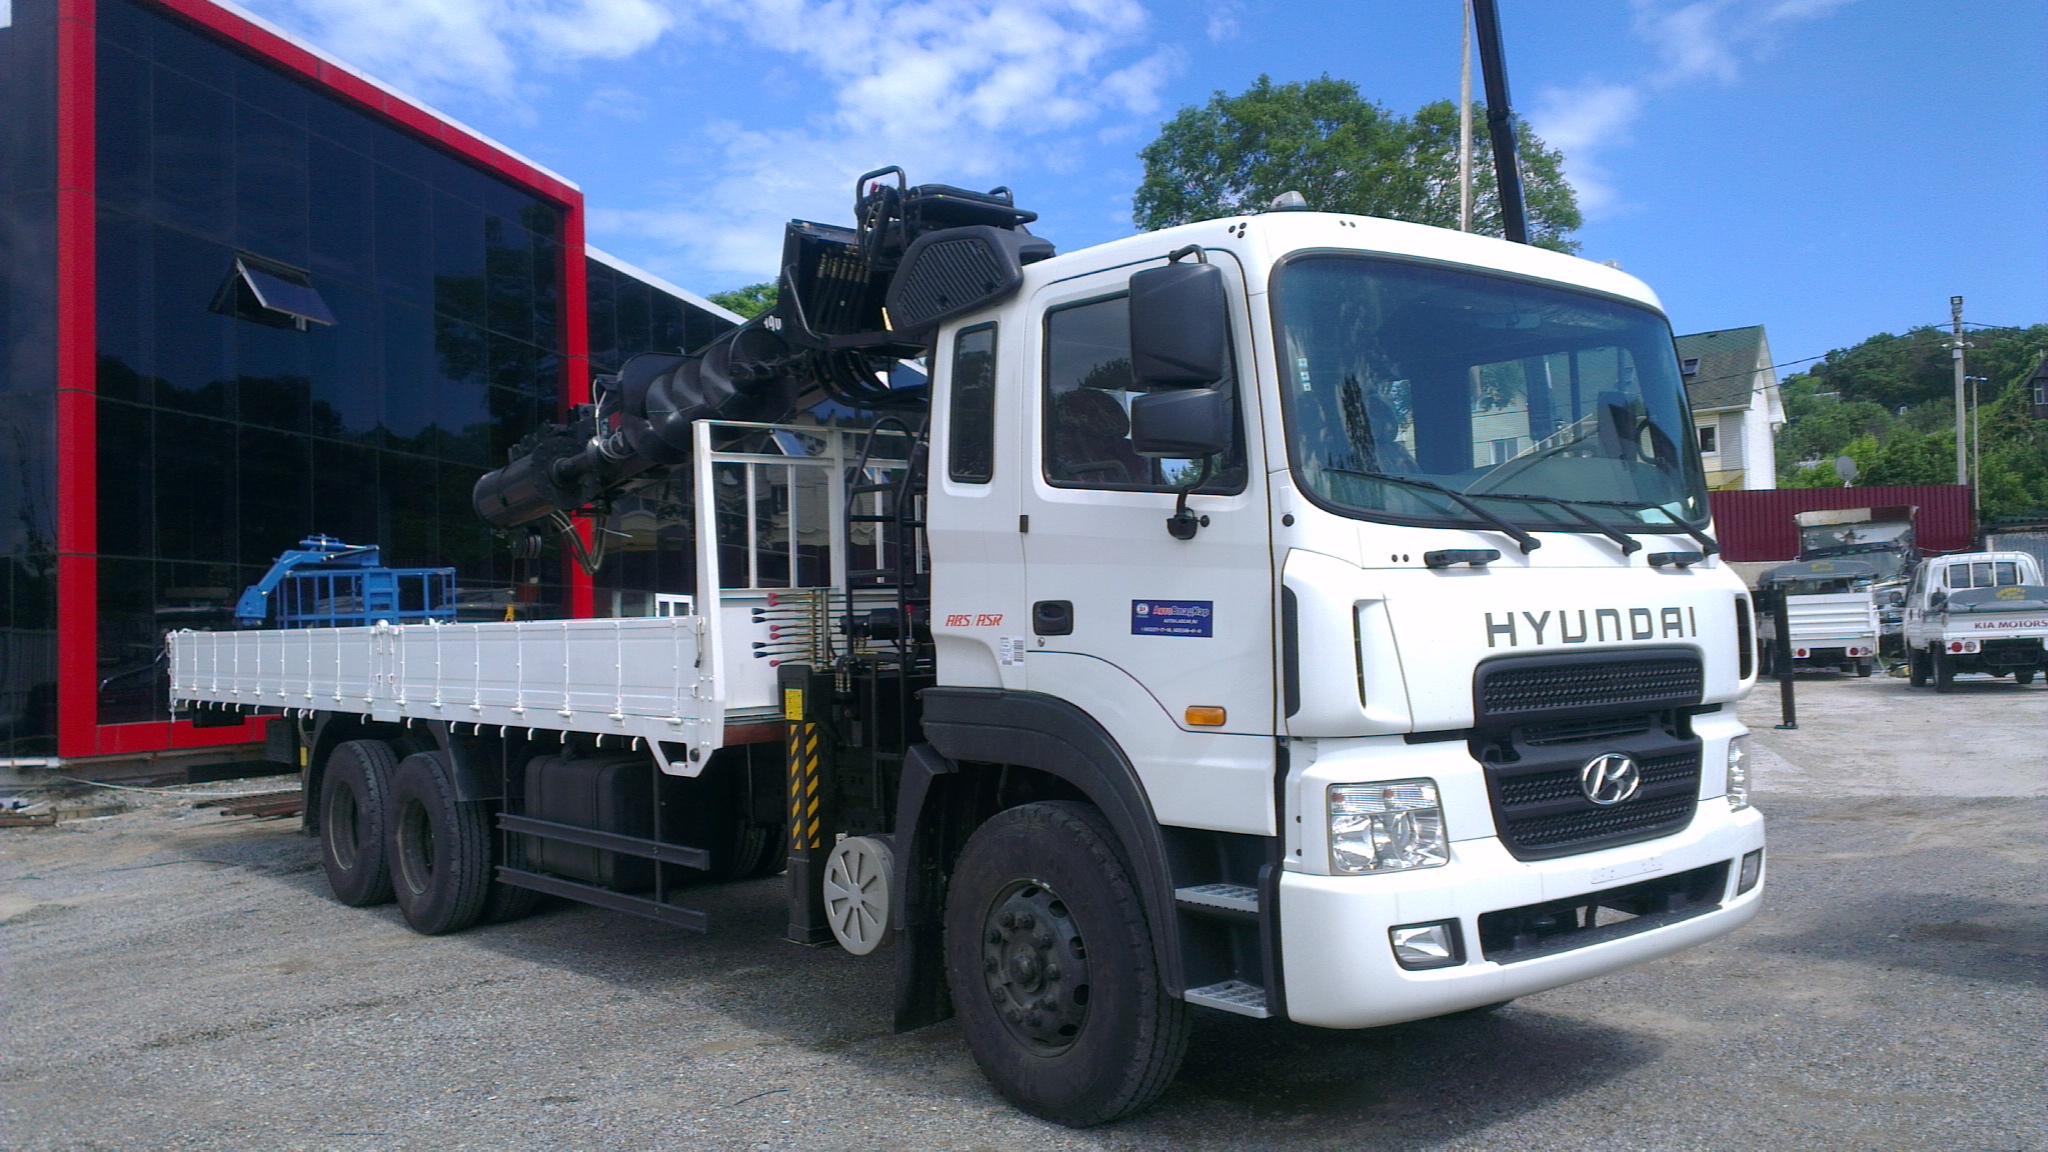 Ремонт двигателей  MITSUBISH 4D33, 4D34-T4,4D35, 4D36.HYUNDAI D4AF, D4AK, D4AE